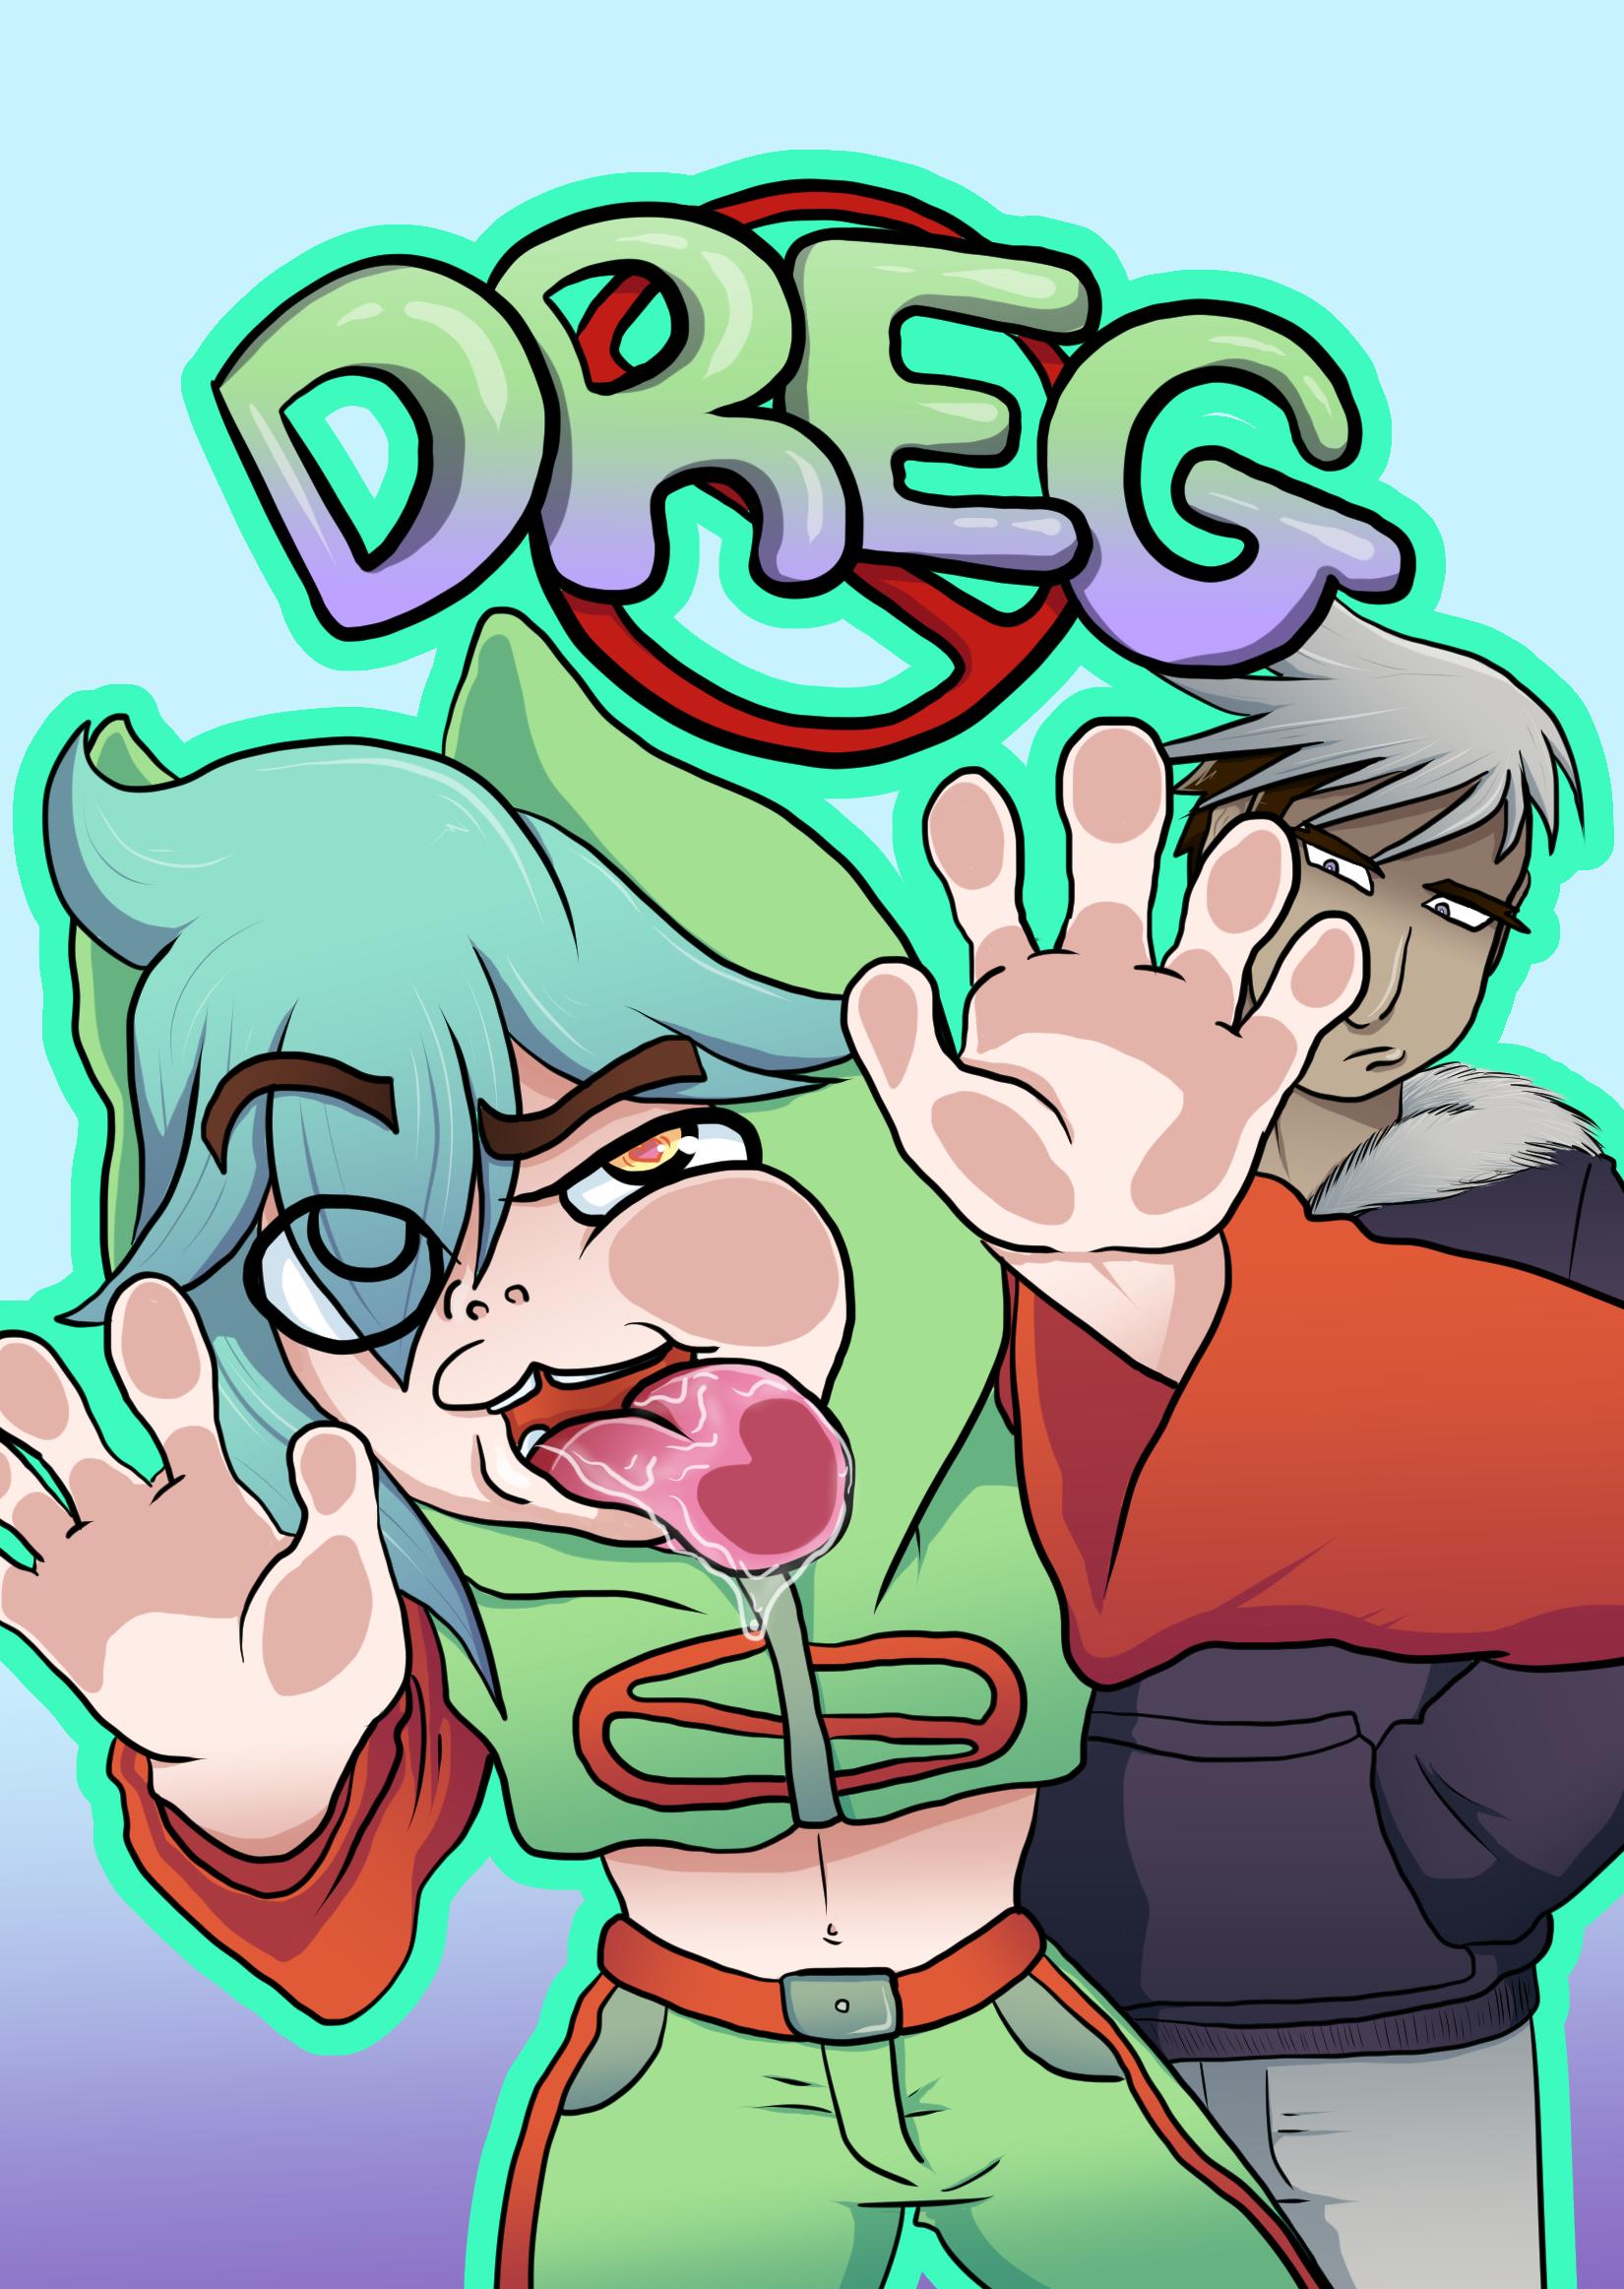 Dreg Cover 1